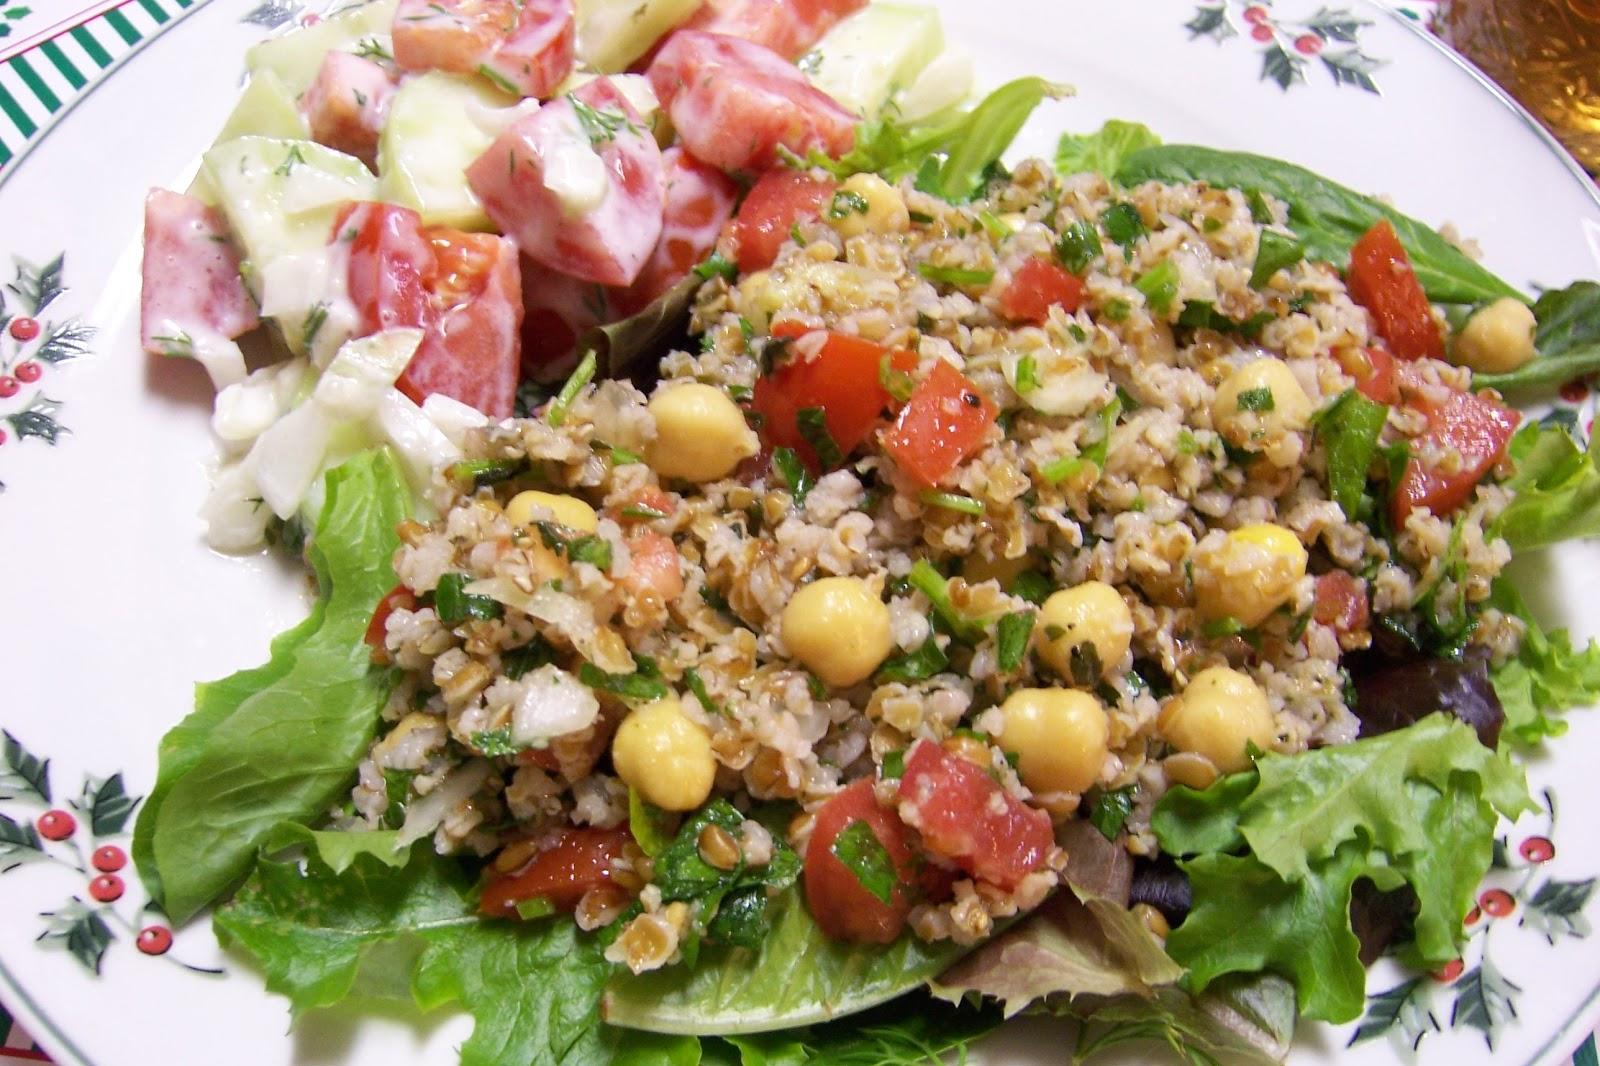 Jeana's Healthy, Tasty, Quick, and Budget-Friendly Recipes